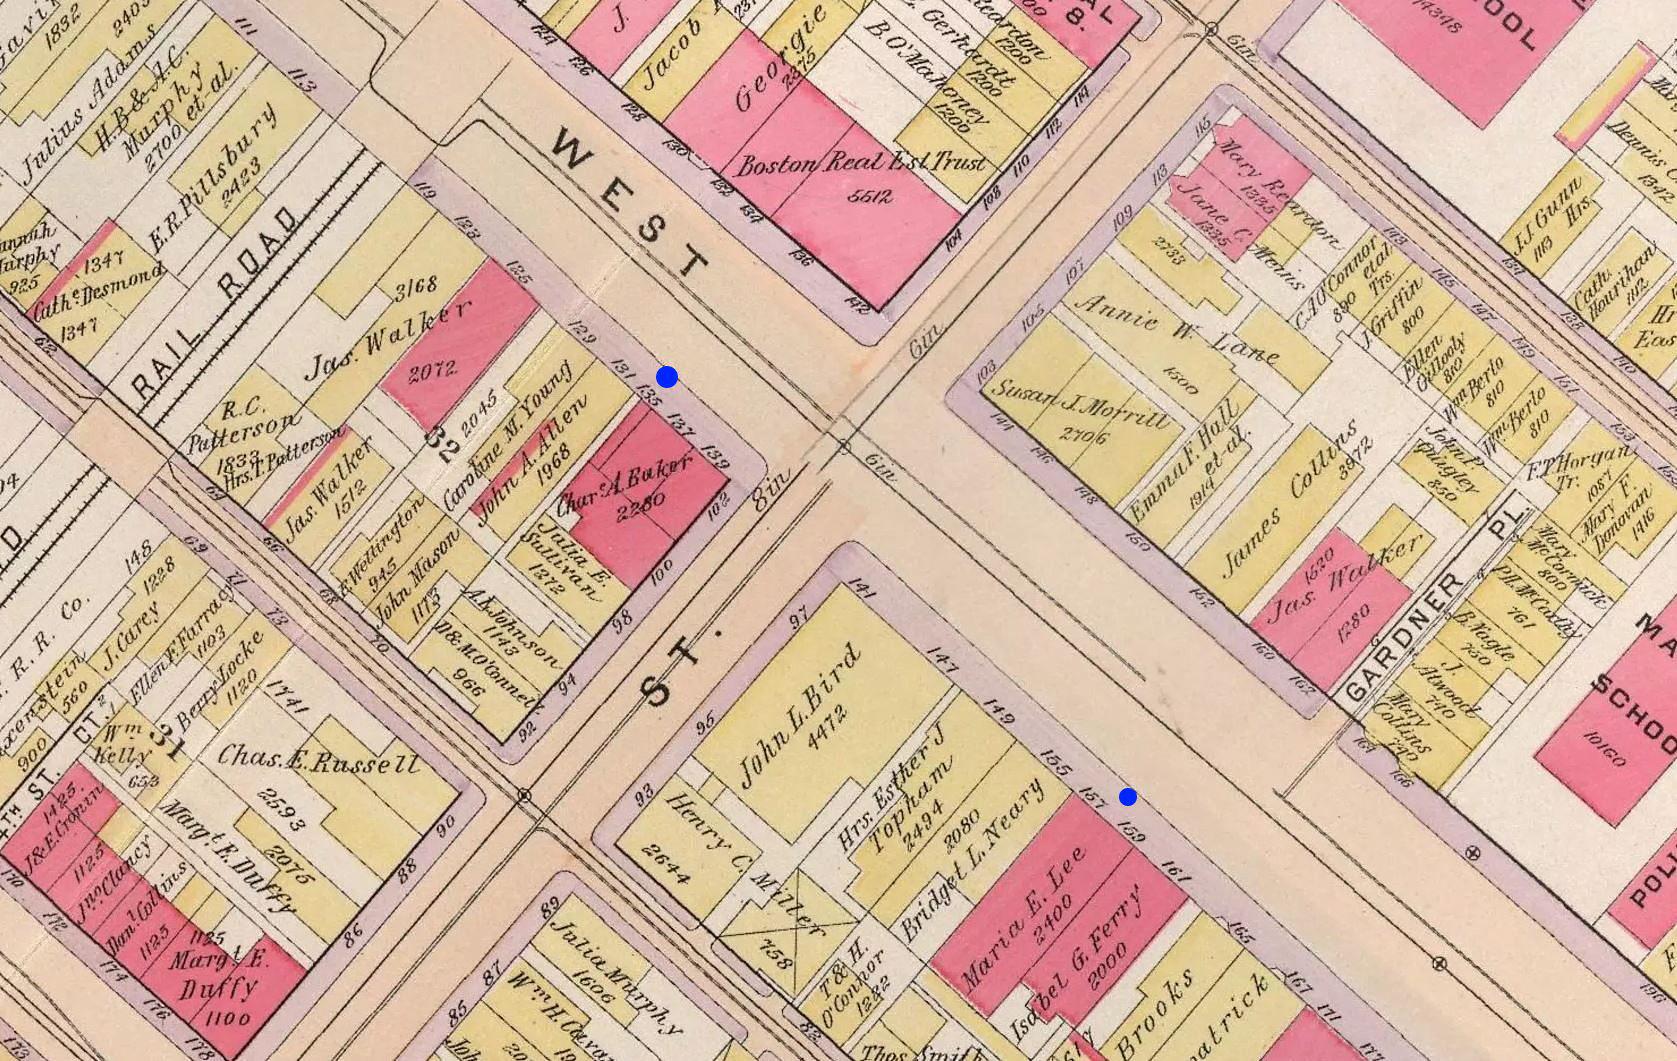 W Broadway Street, Boston, 1899